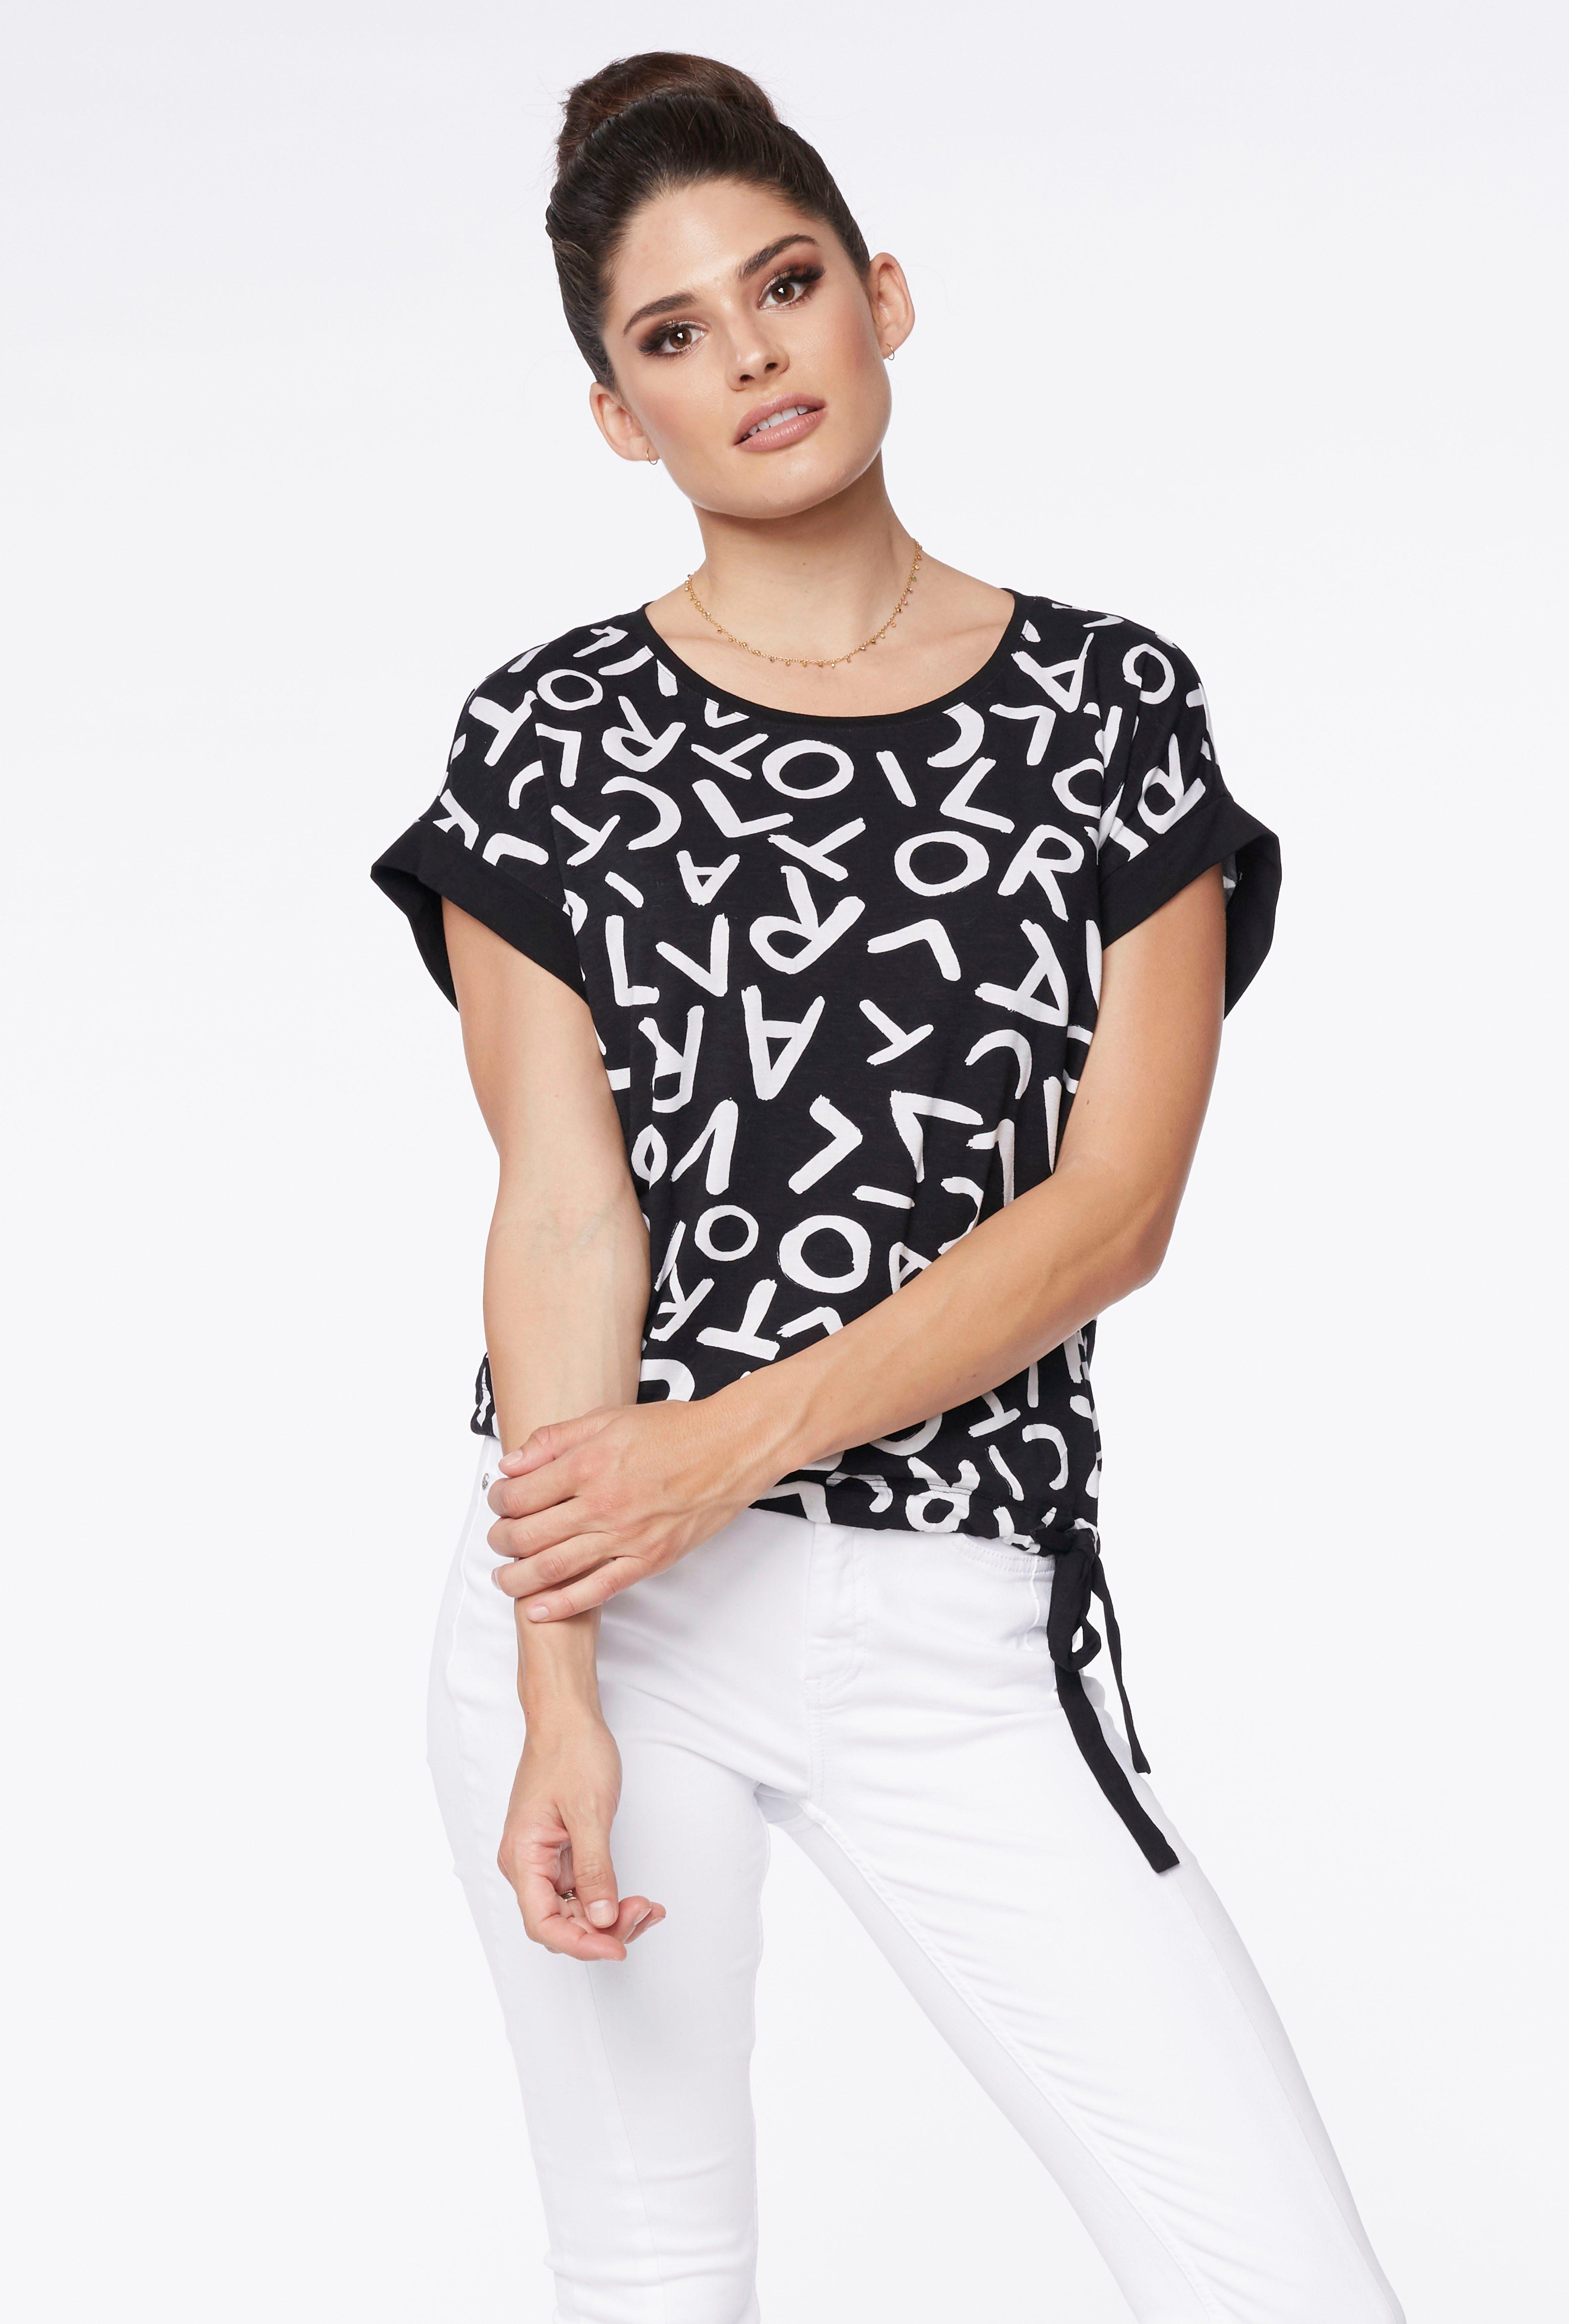 Tunika Bluse Blusenshirt Lagenlook Plus Size XXL Oversize 46 48 50 52 54 56 #800